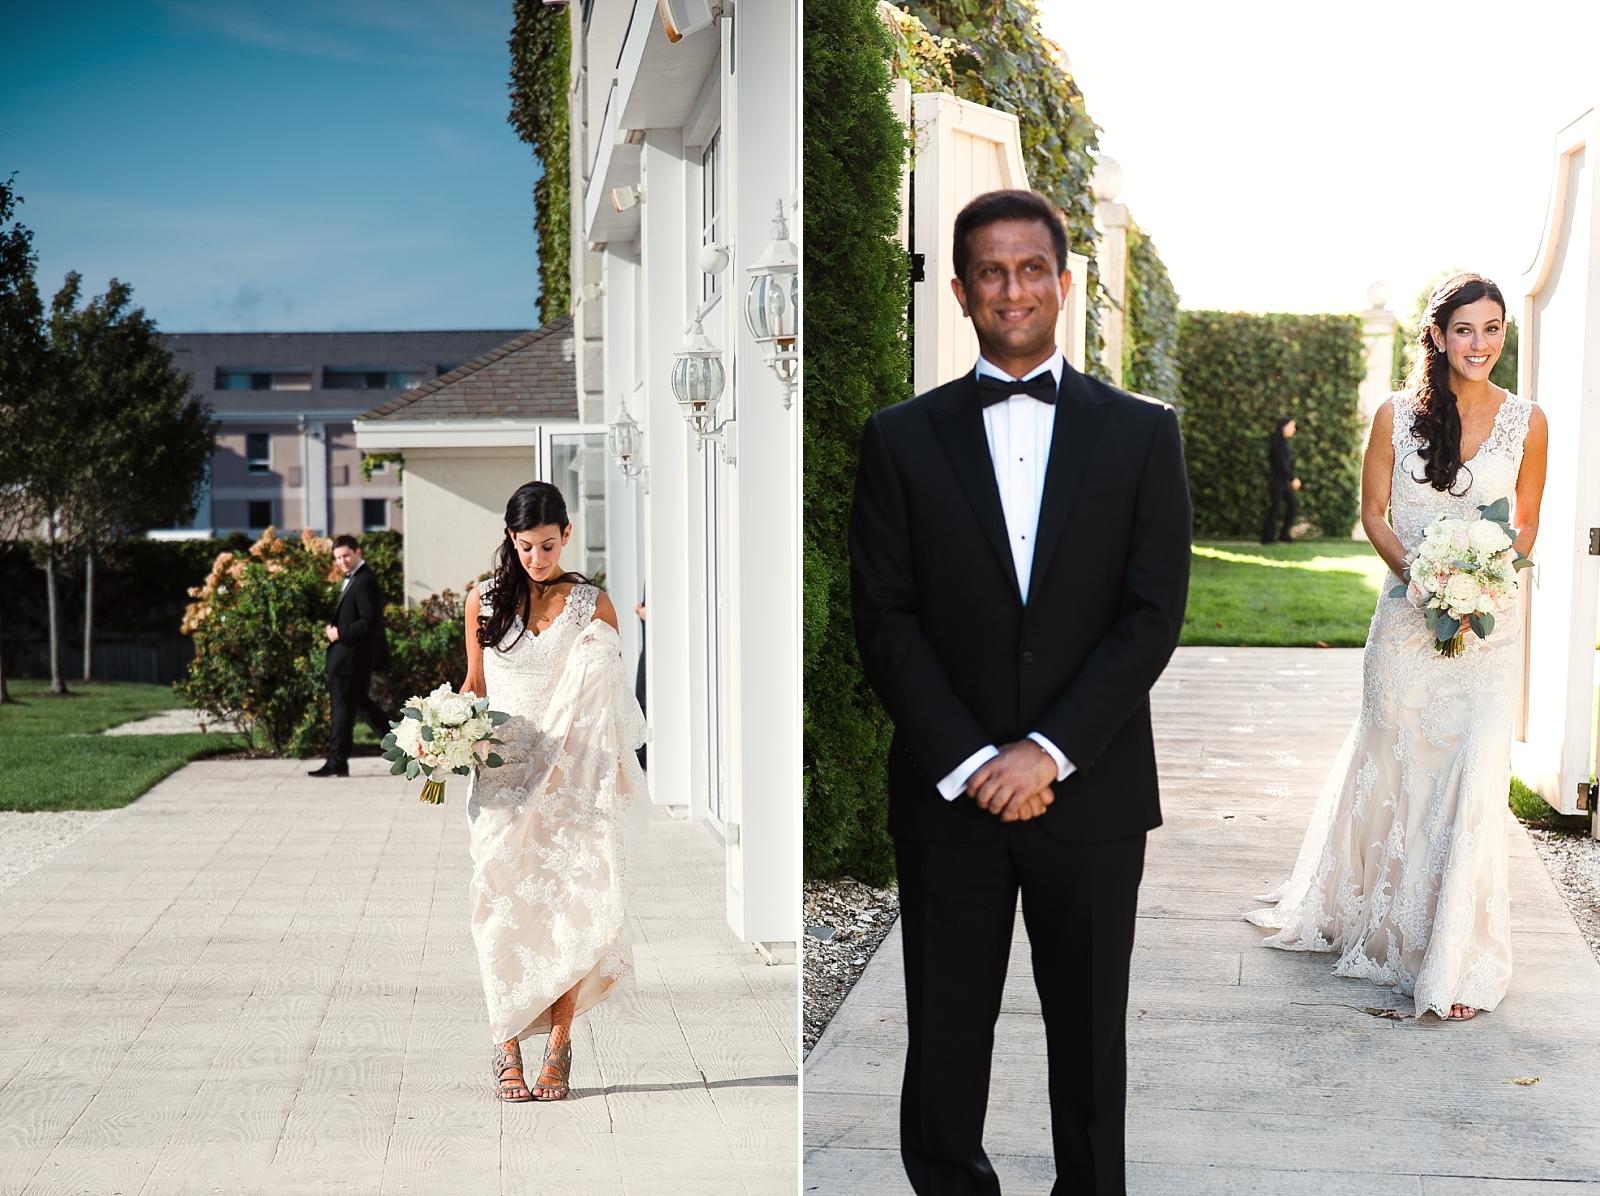 Newport_Wedding_Photographer_RaAj_Gallery_37.jpg